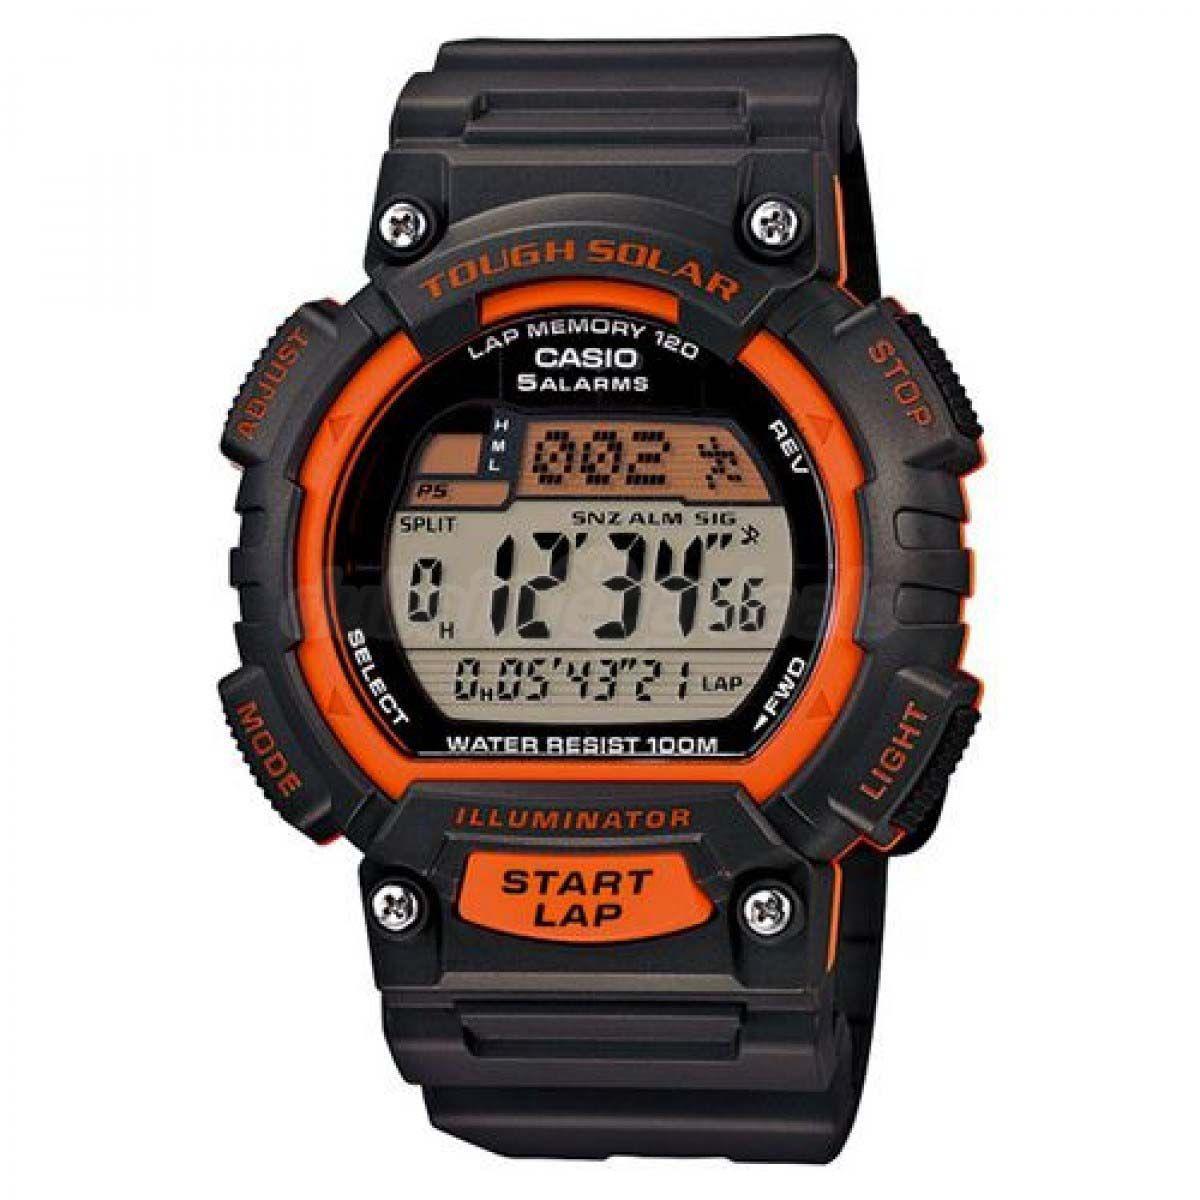 c59f228a381 Relógio Casio Standard Digital Tough Solar Masculino STL-S100H-4AVDF R   452